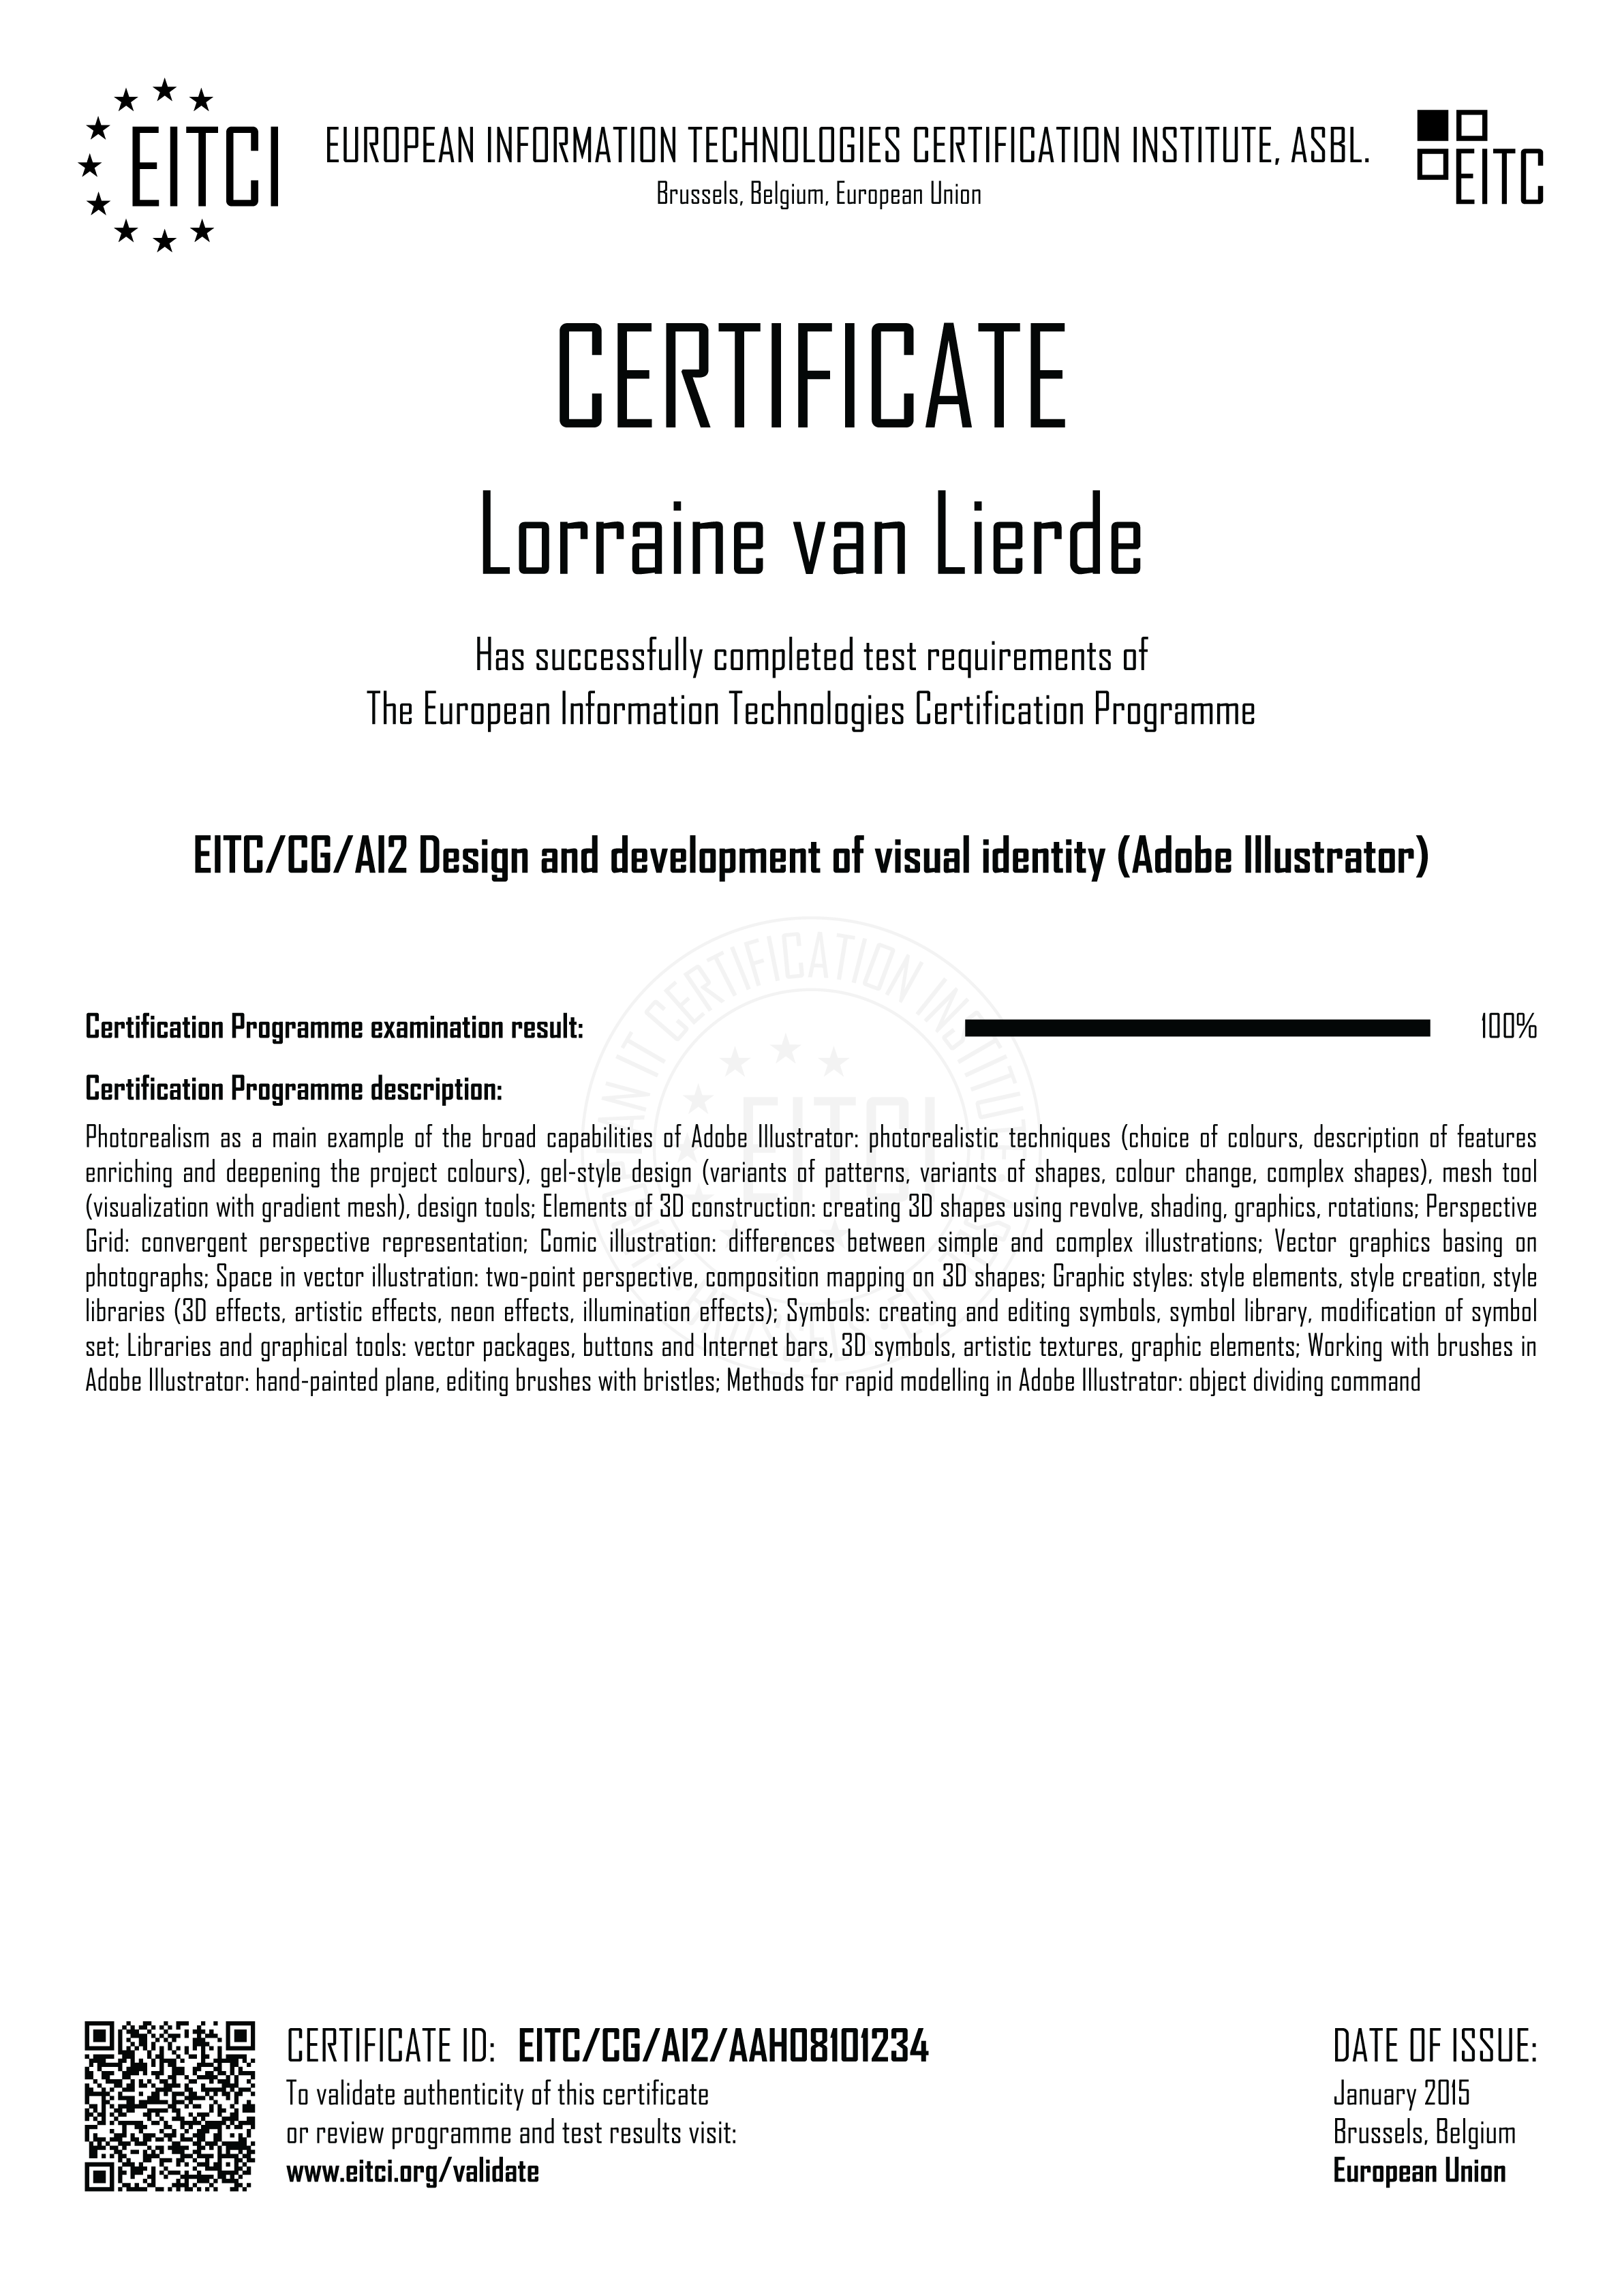 Eitccgai2 Design And Development Of Visual Identity Adobe